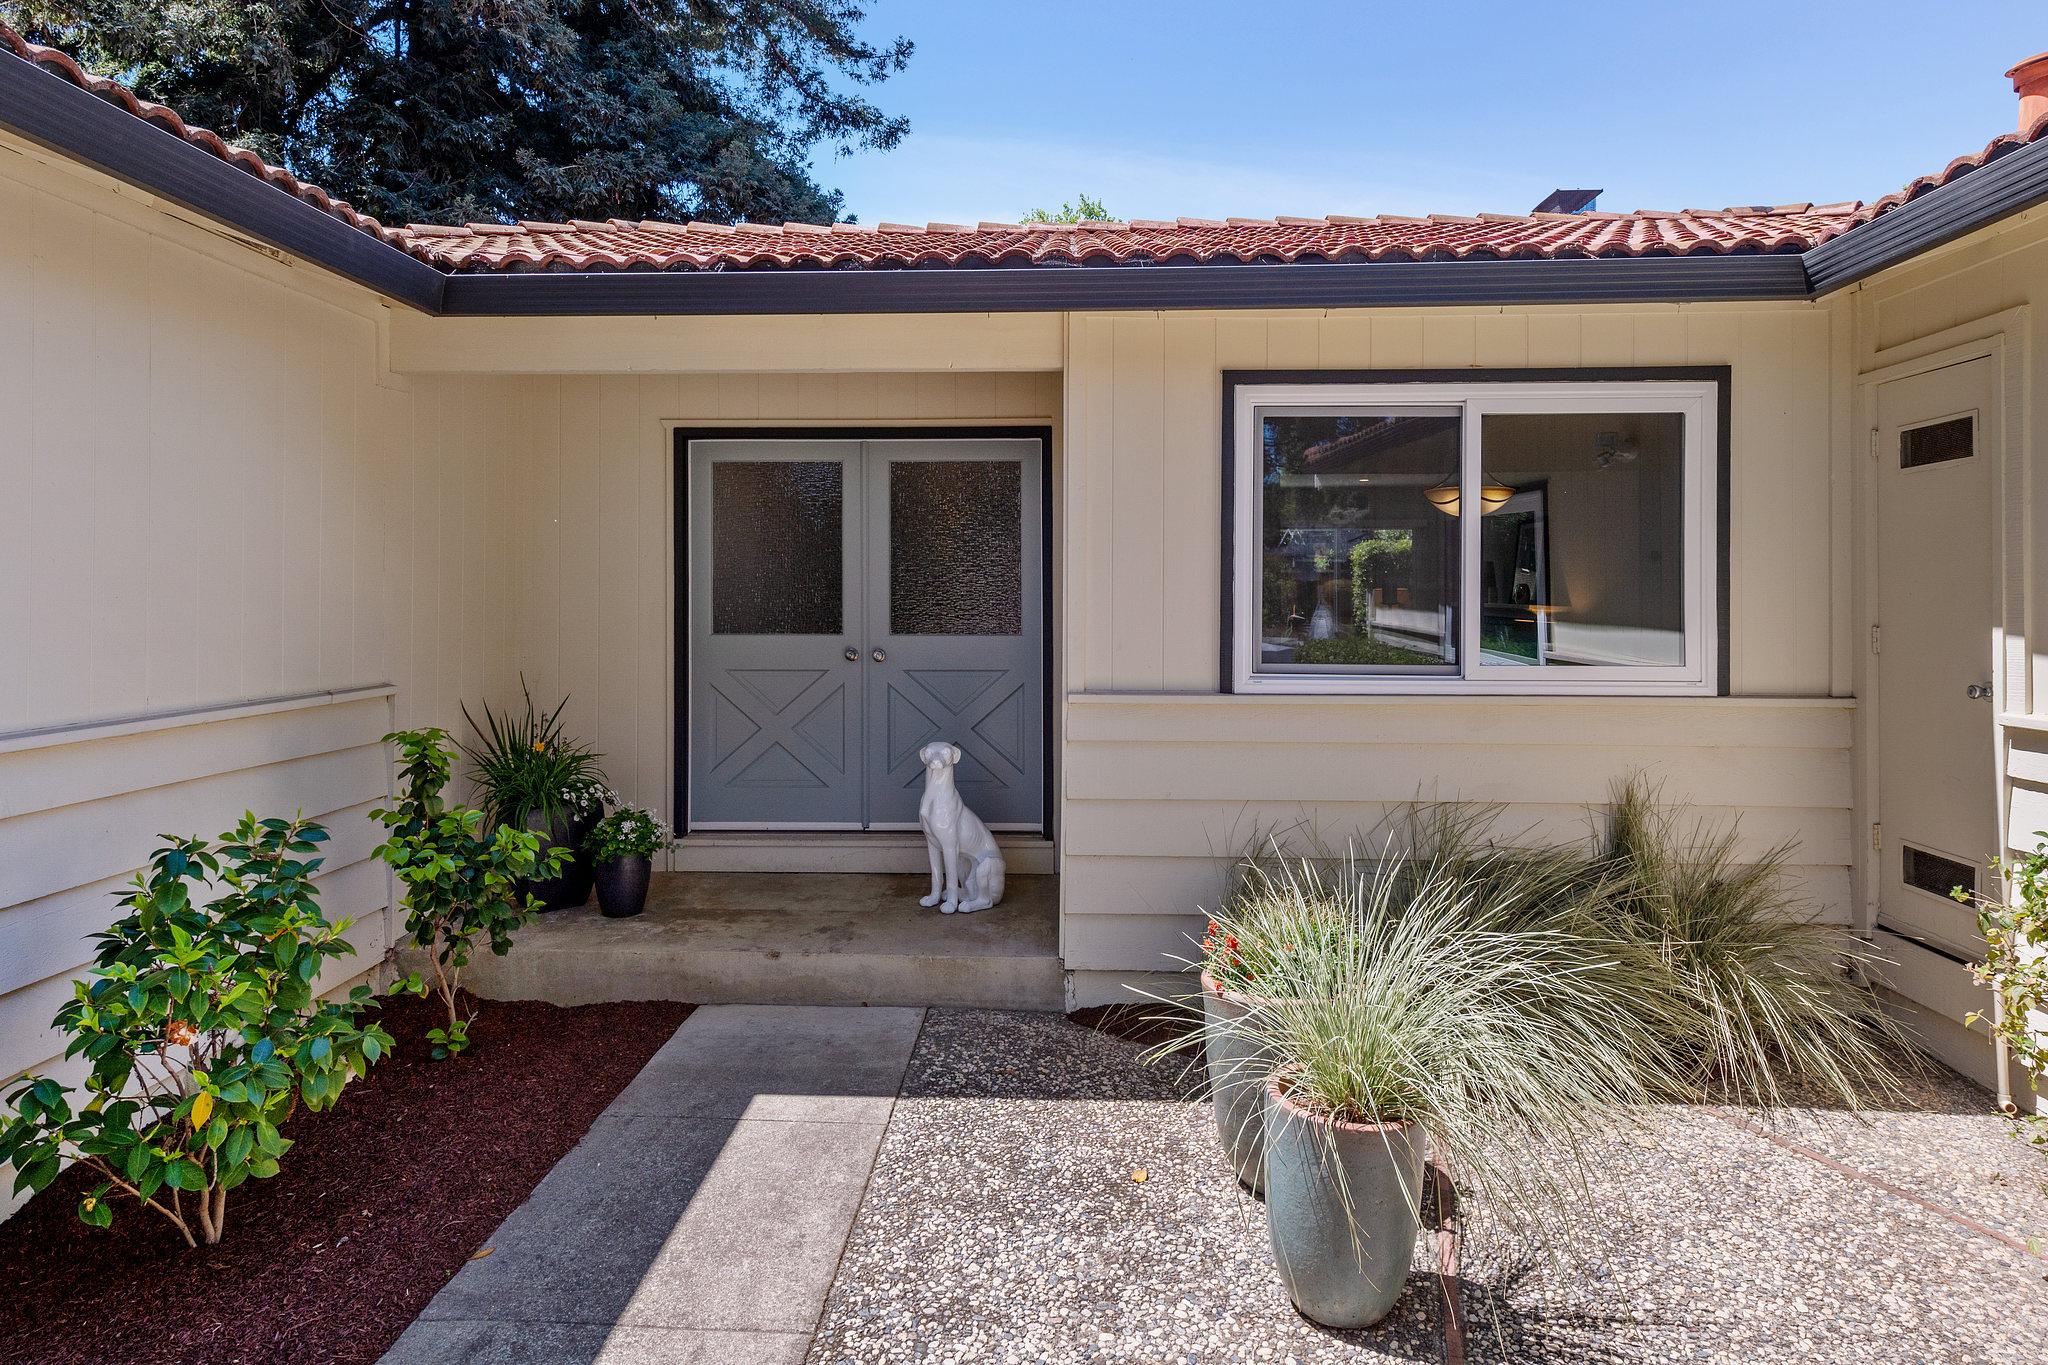 Sunnyvale Homes for Sale